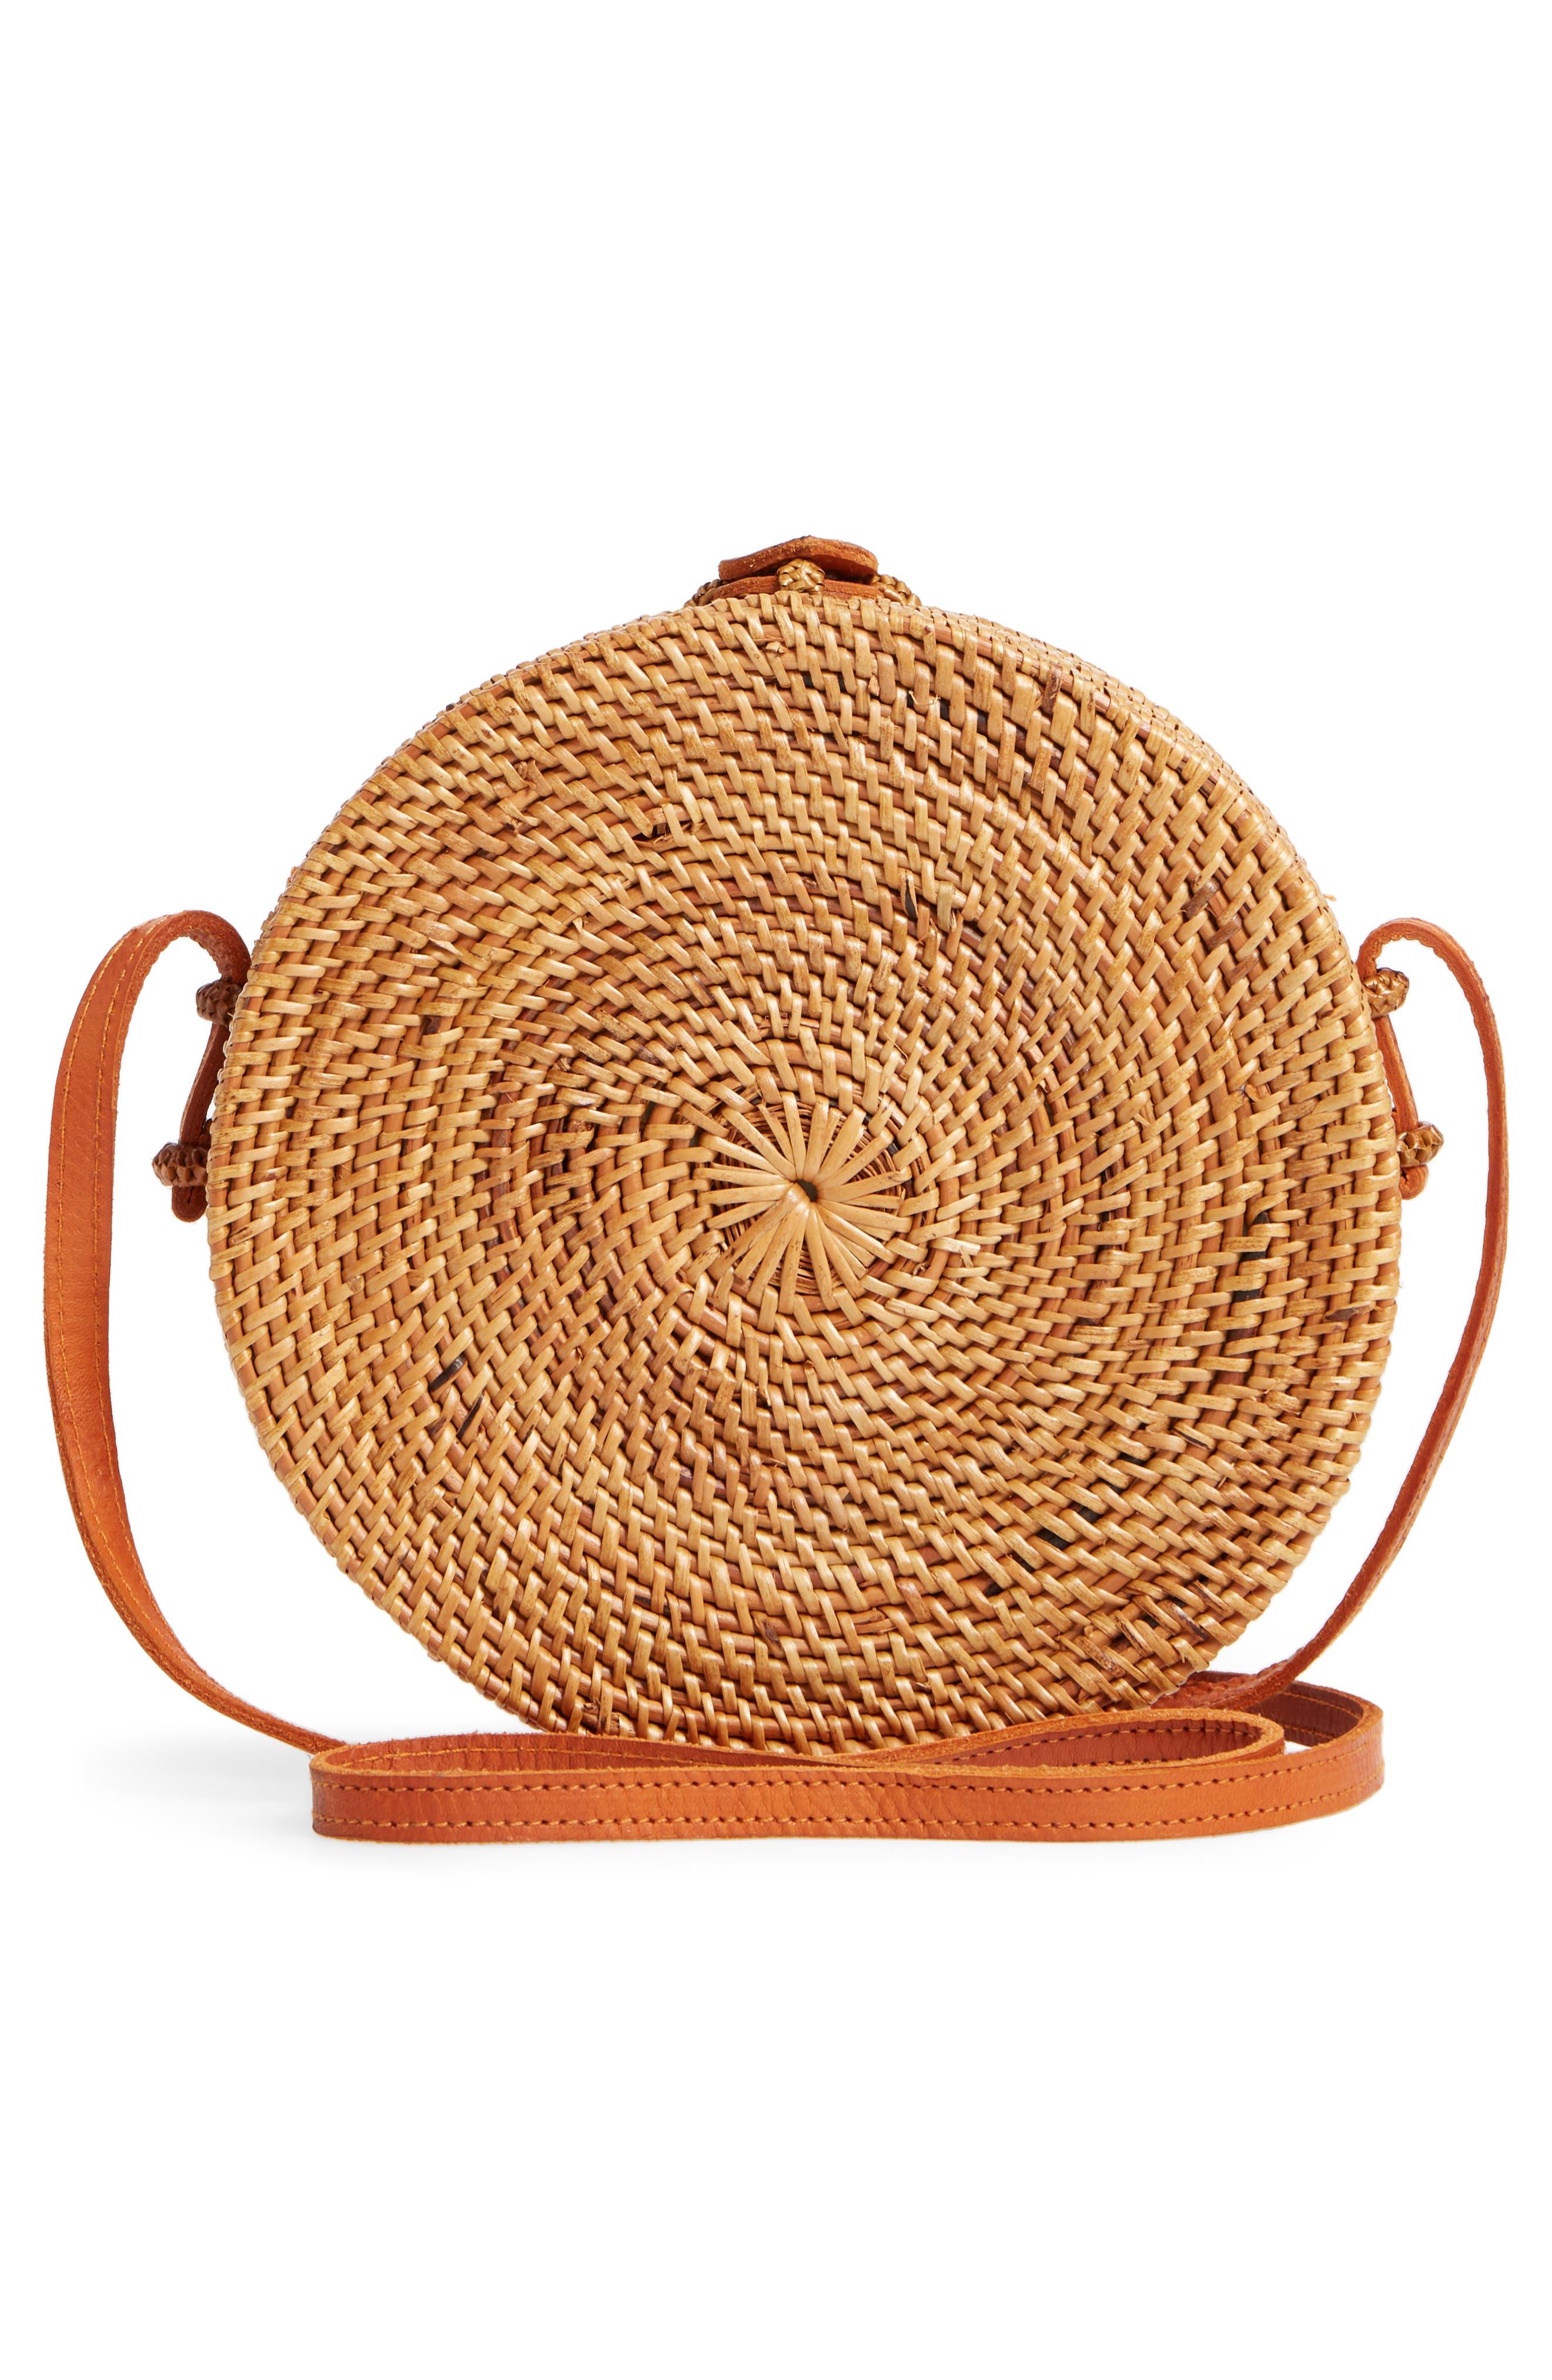 Woven Rattan Circle Basket Crossbody,                             Alternate thumbnail 3, color,                             200